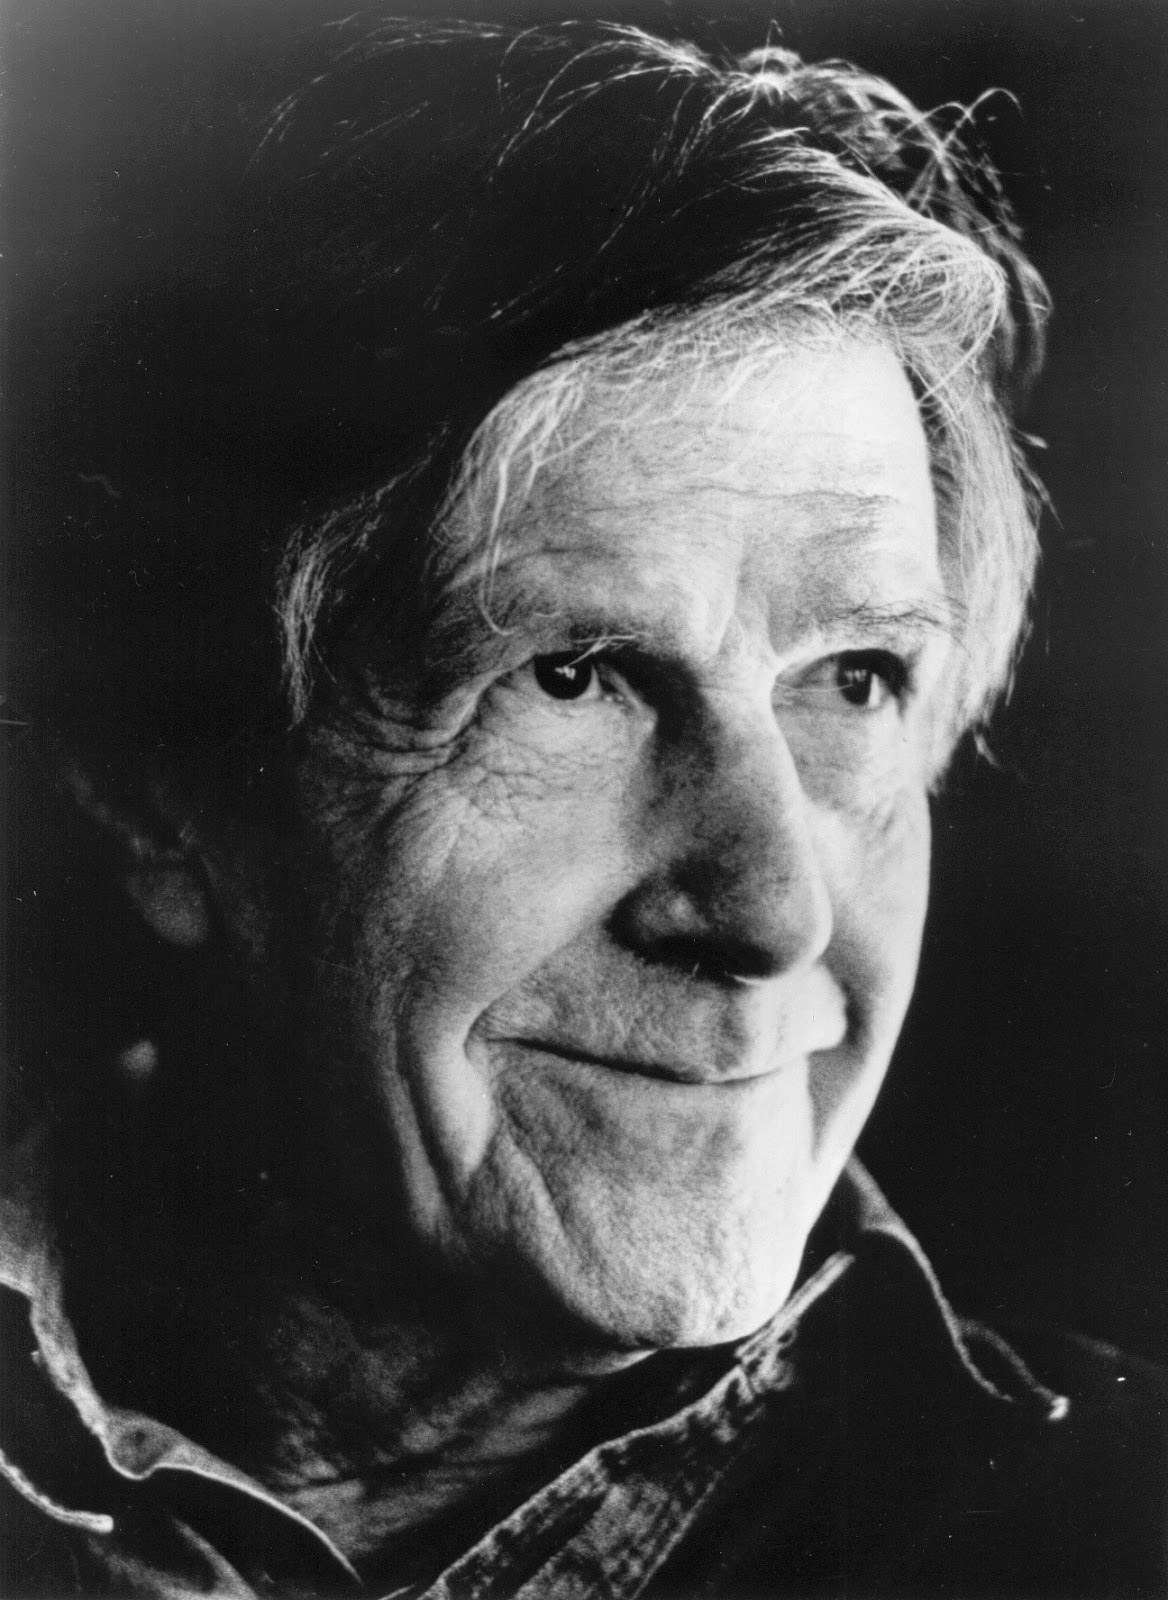 John Cage - Live